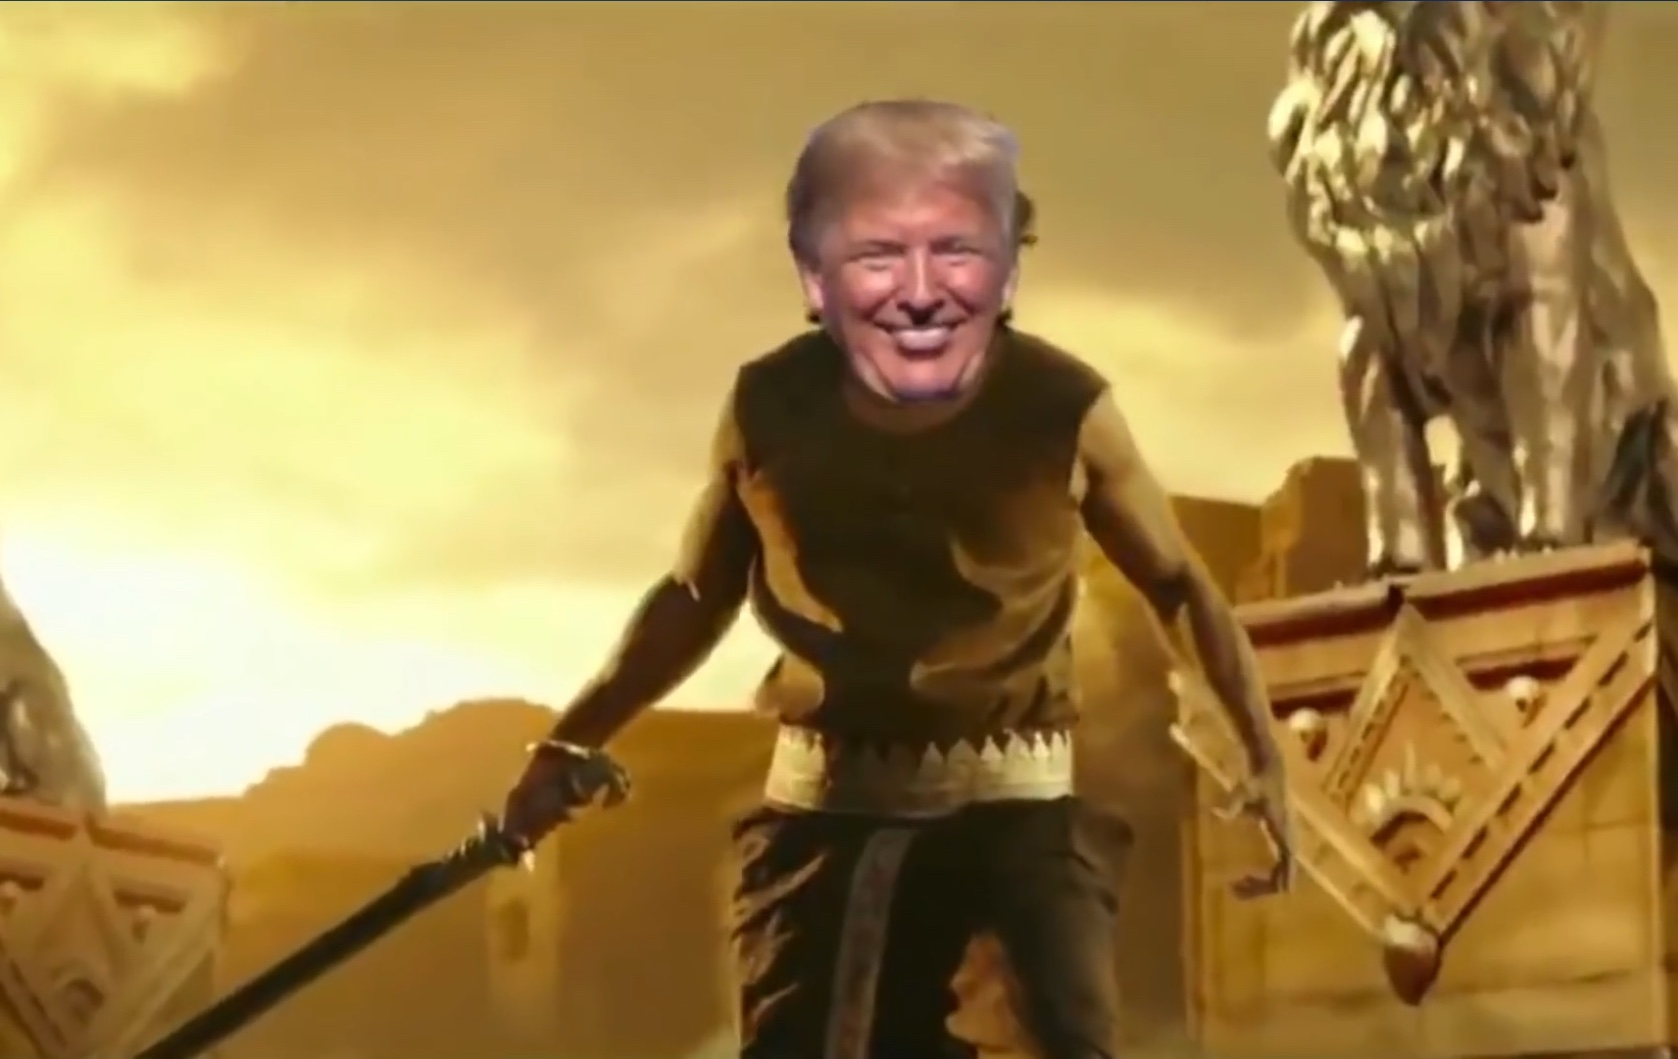 Caption: Trump as Baahubali